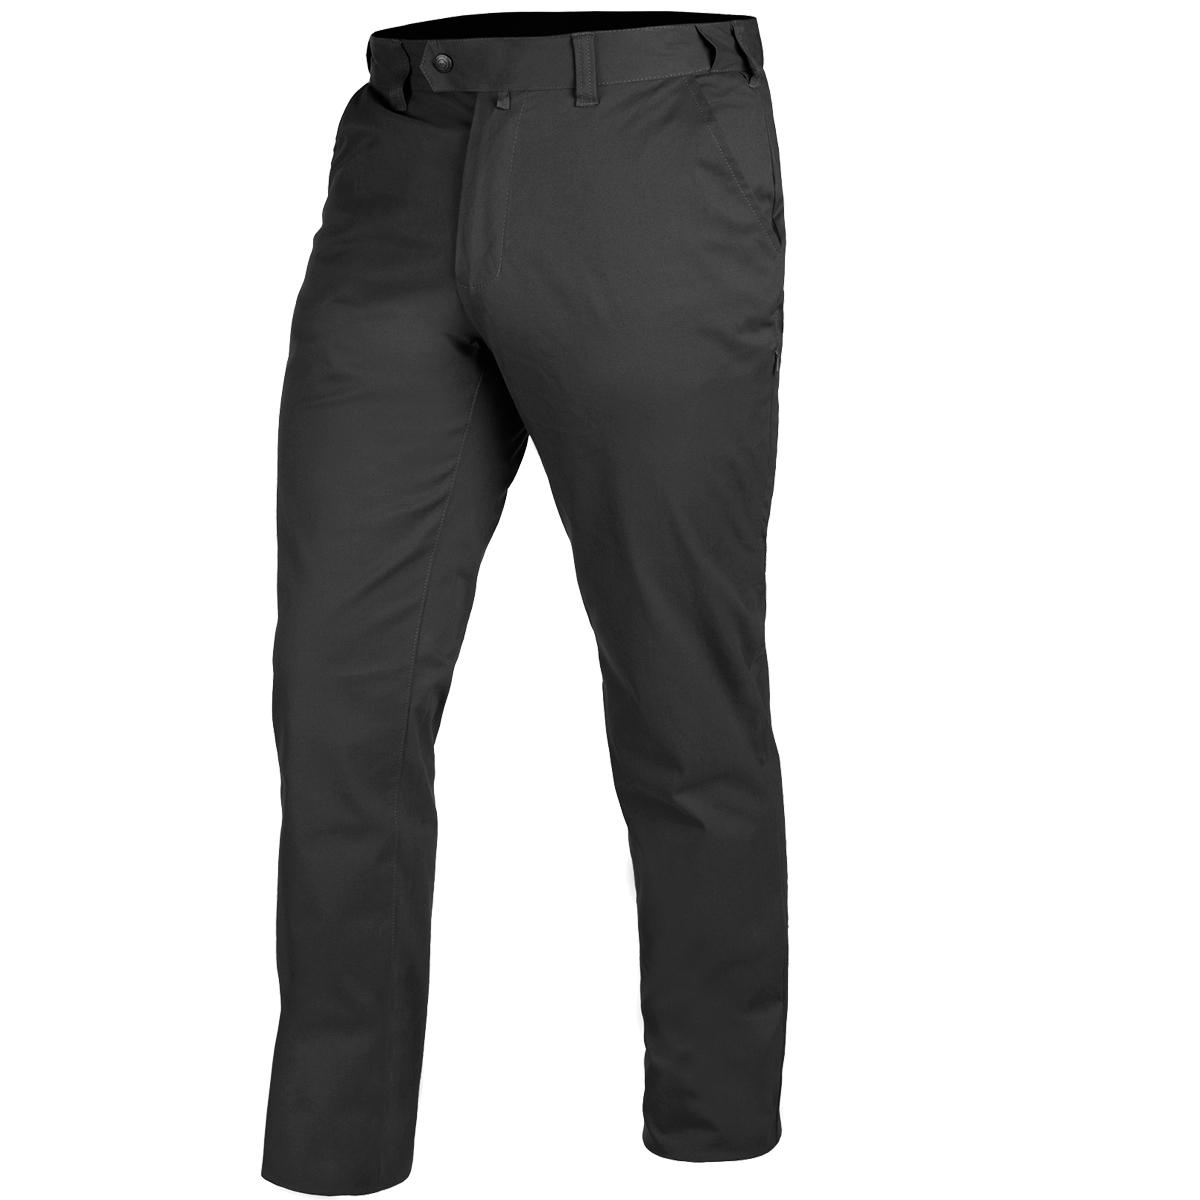 pentagon tactical covert pants black tactical military 1st